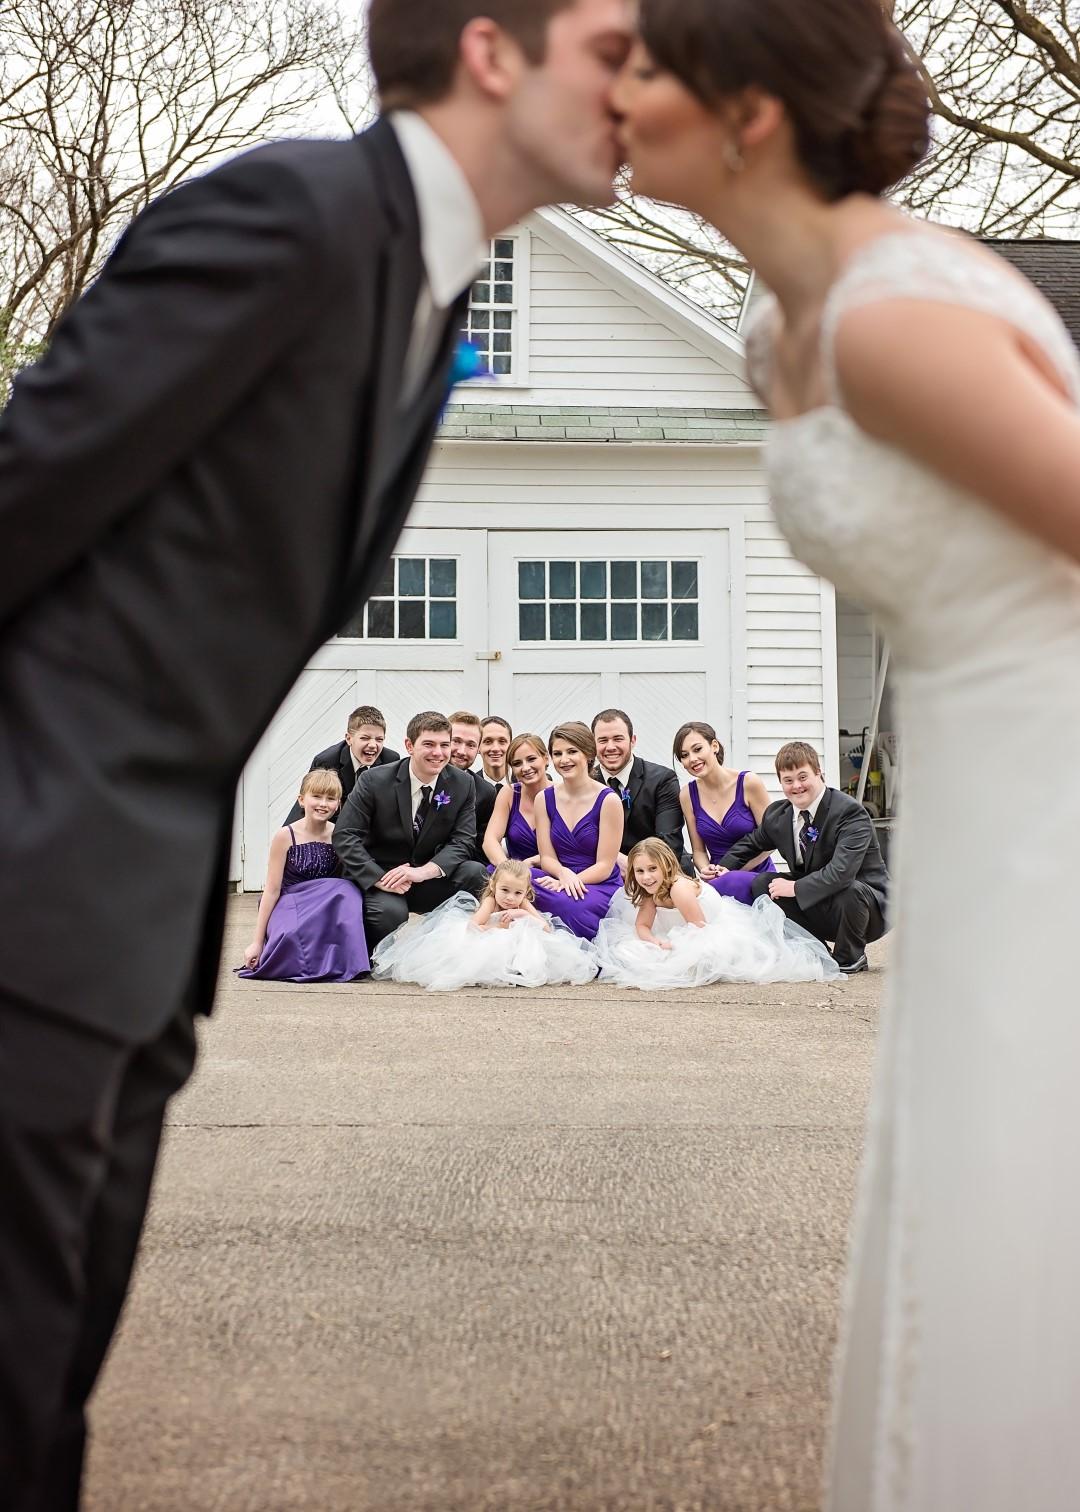 Haught Wedding 04 (Large).jpg